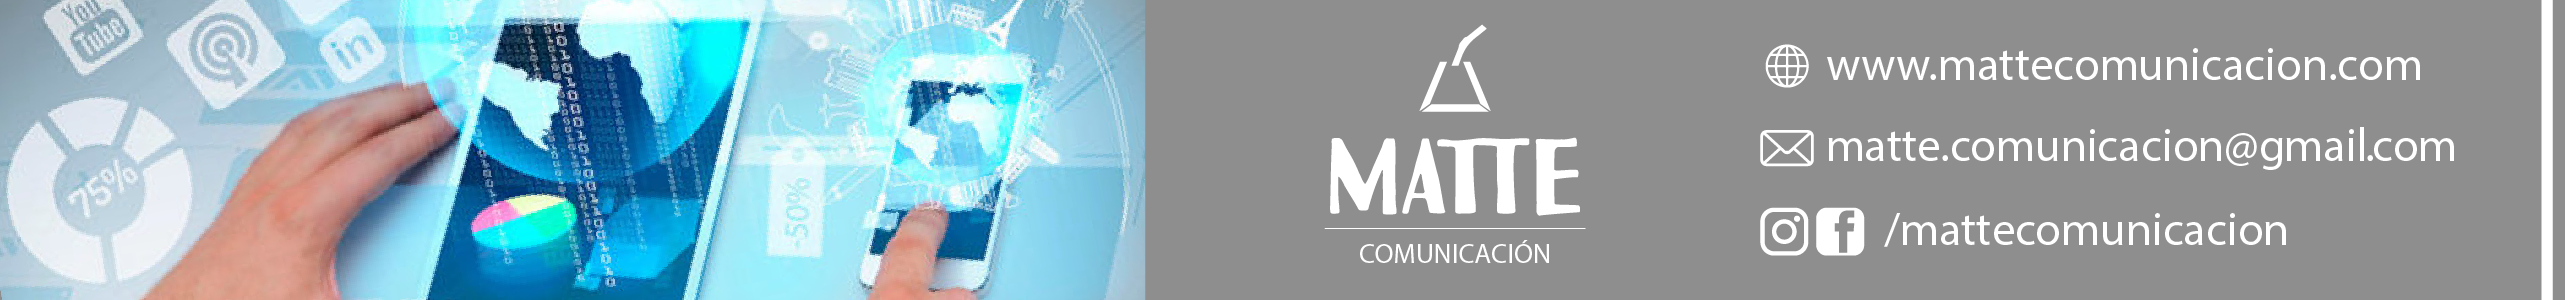 banner-matte4